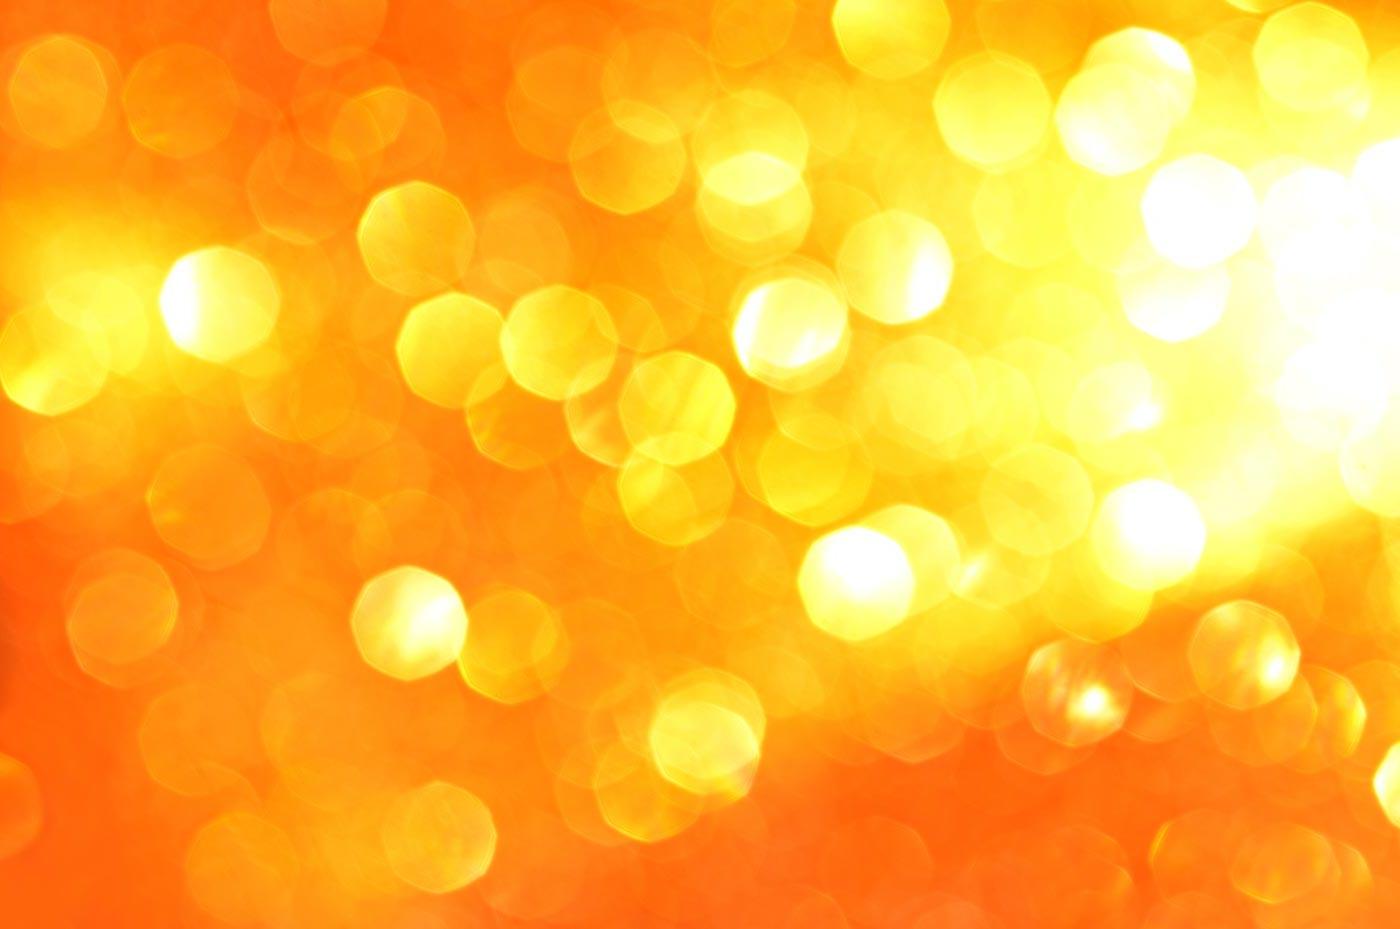 string lights orange hd wallpaper - photo #13